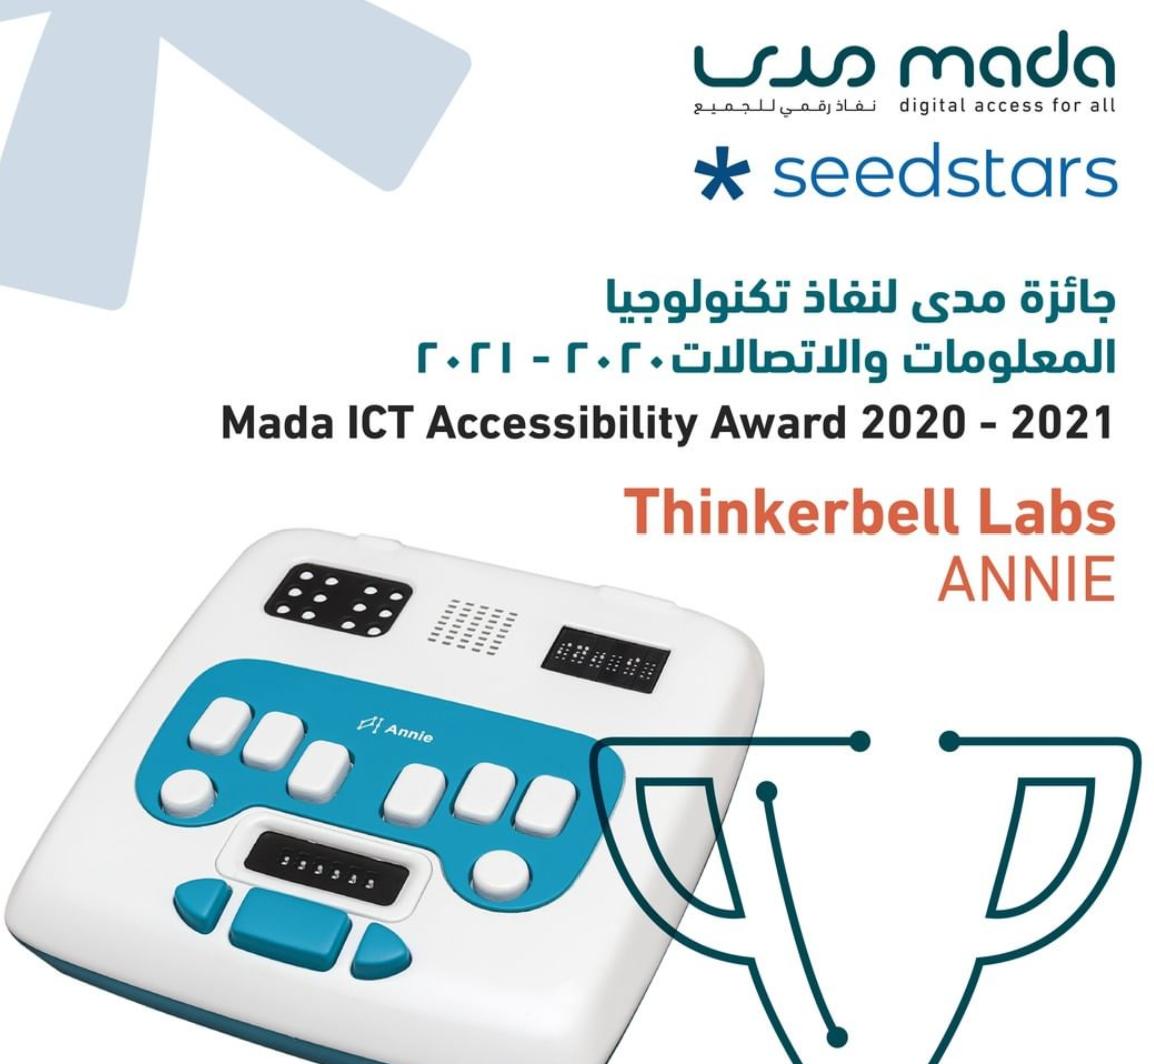 Mada-Seedstars ICT Accessibility Awards 2020-2021